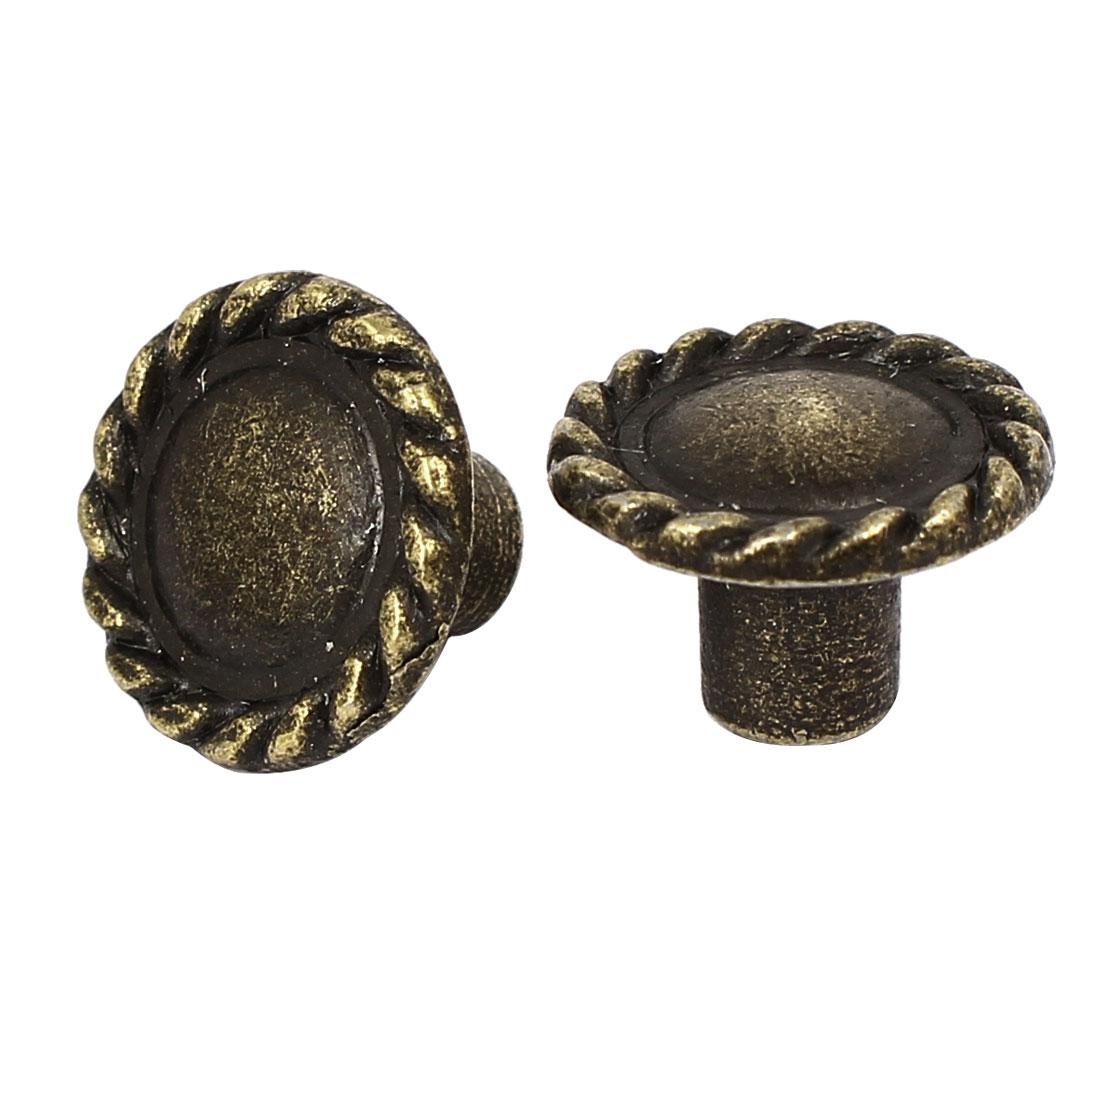 3.5mm Threaded 13mm Diameter Metal Screw Type Pull Knob Bronze Tone 2pcs